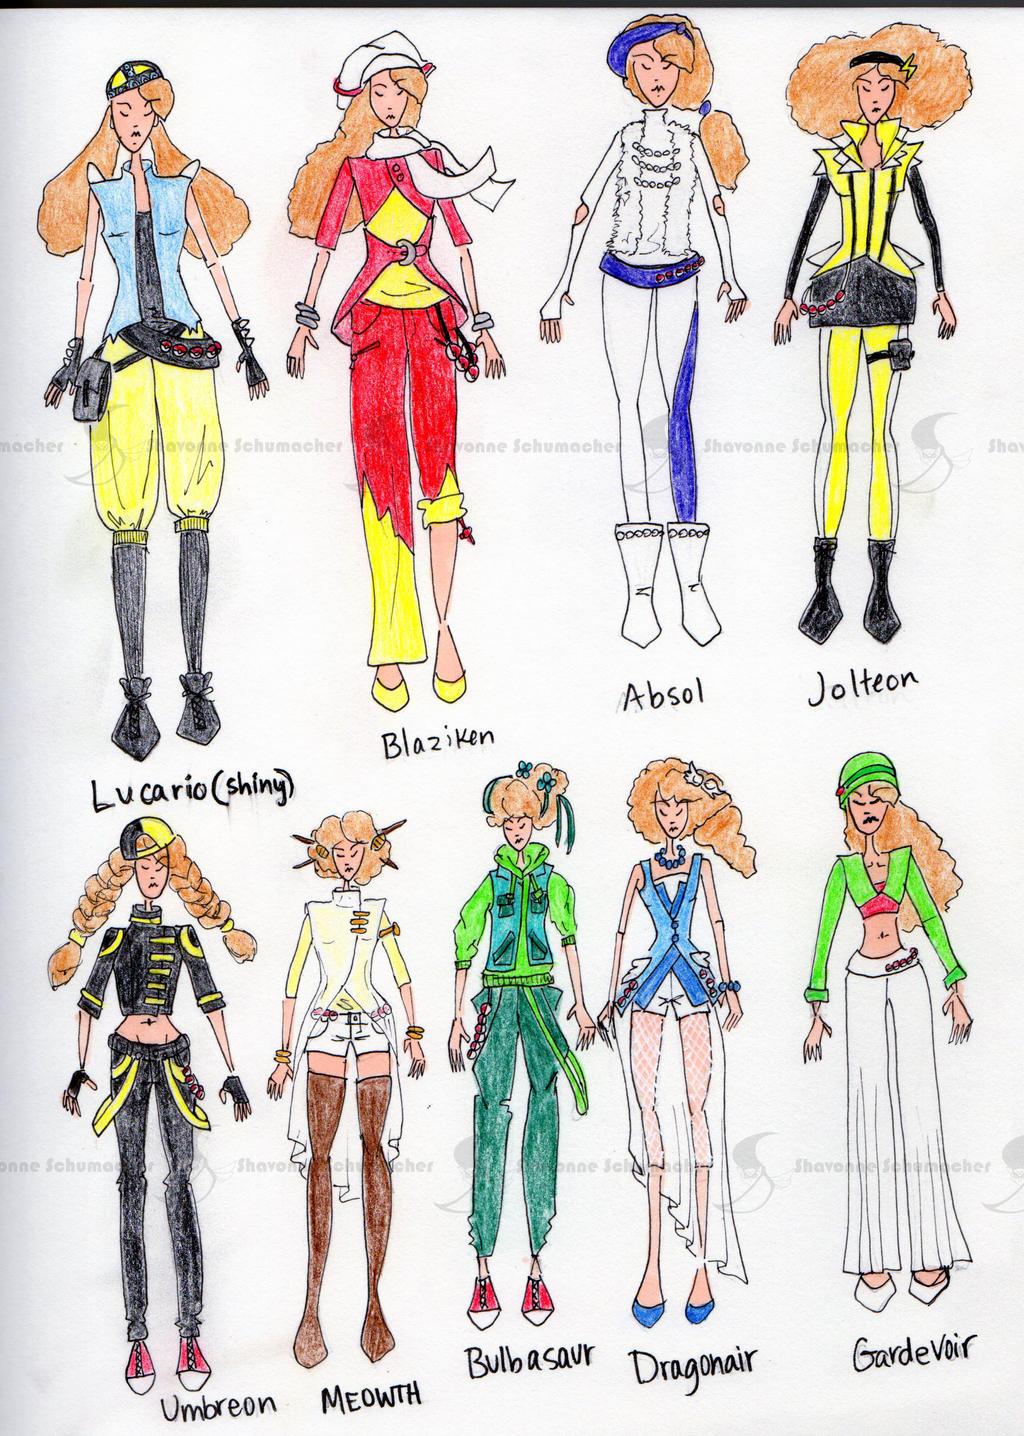 Azura Pokemon Trainer Designs By Sufon On DeviantArt